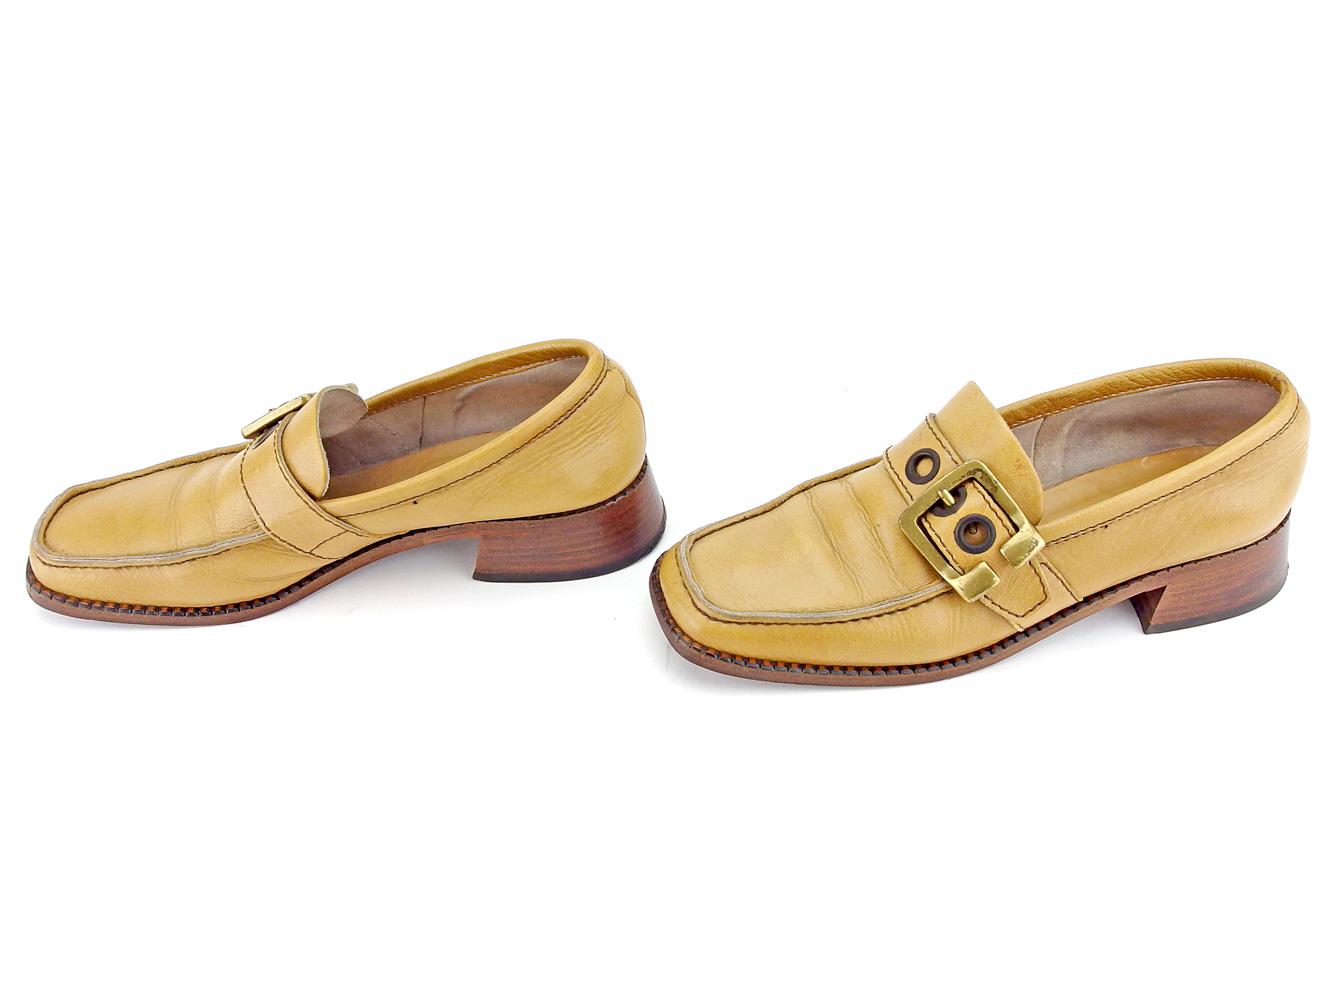 b19ba5257 ミュウミュウ miu miu loafer shoes shoes Lady's ♯ 37 half square toe belt design  beige brown gold leather popularity sale B1074.